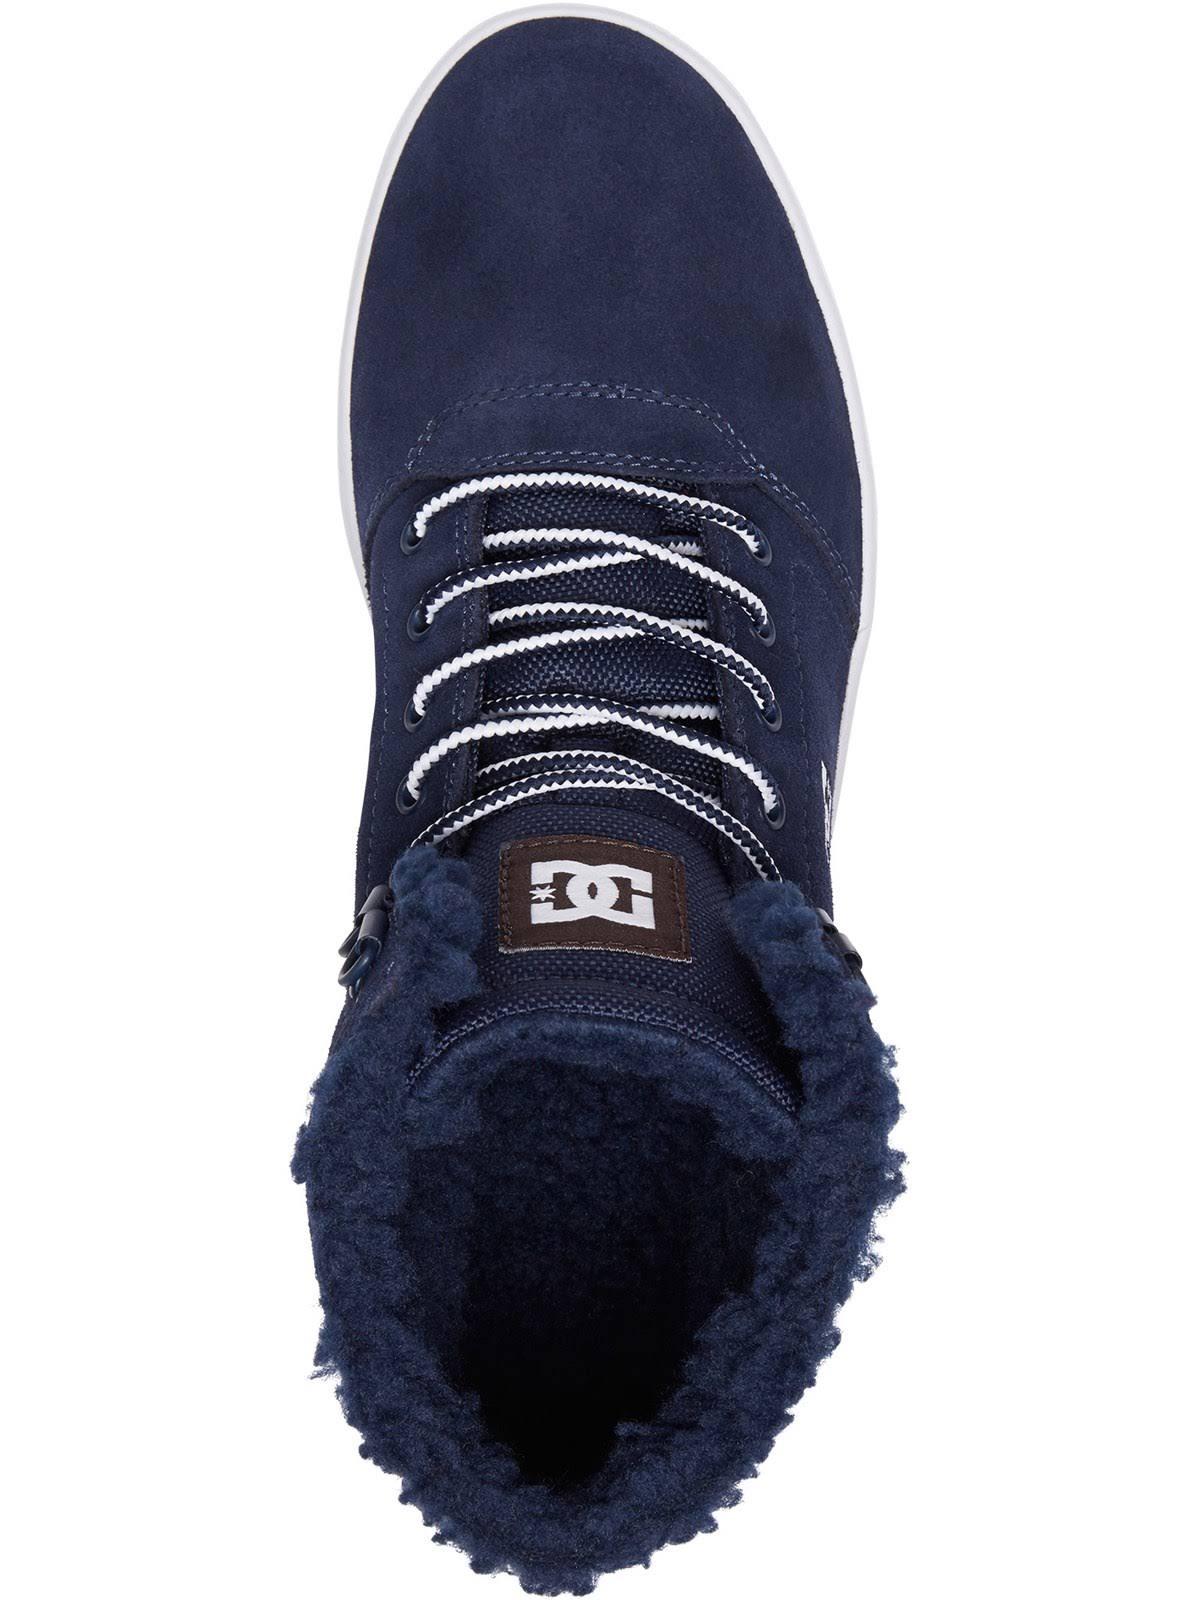 High 2 40 Crisis Dc Niebieski Eu 1 Shoes On8E4HqW1